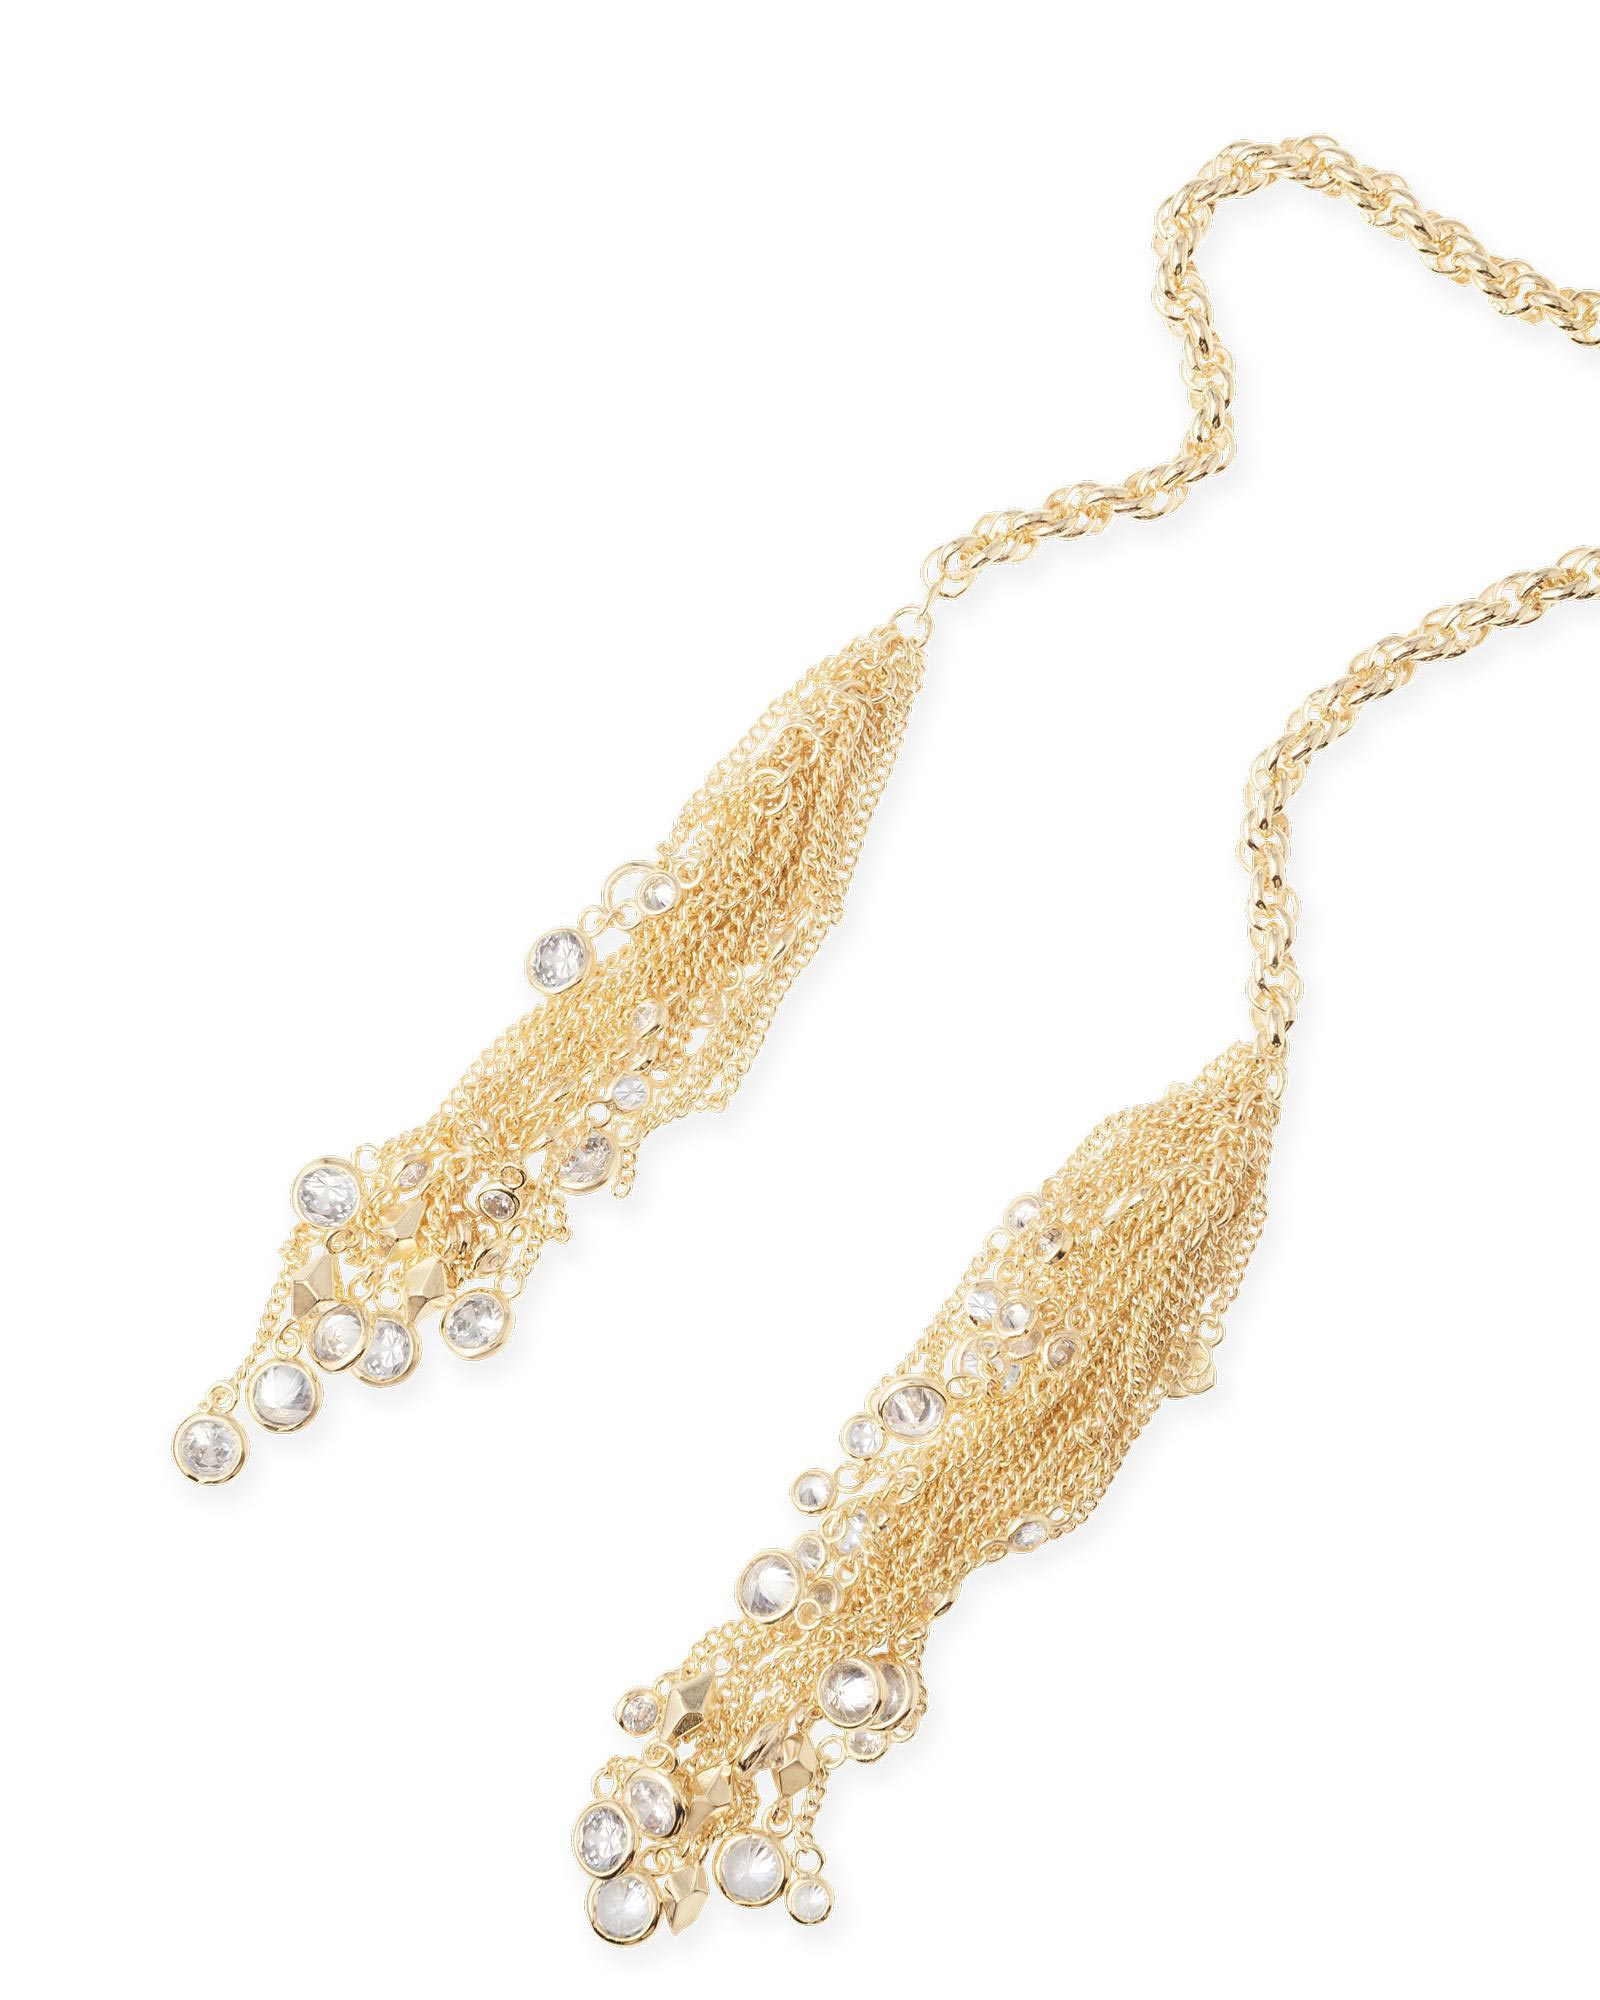 Sloan Lariat Necklace in Gold | Kendra Scott Jewelry